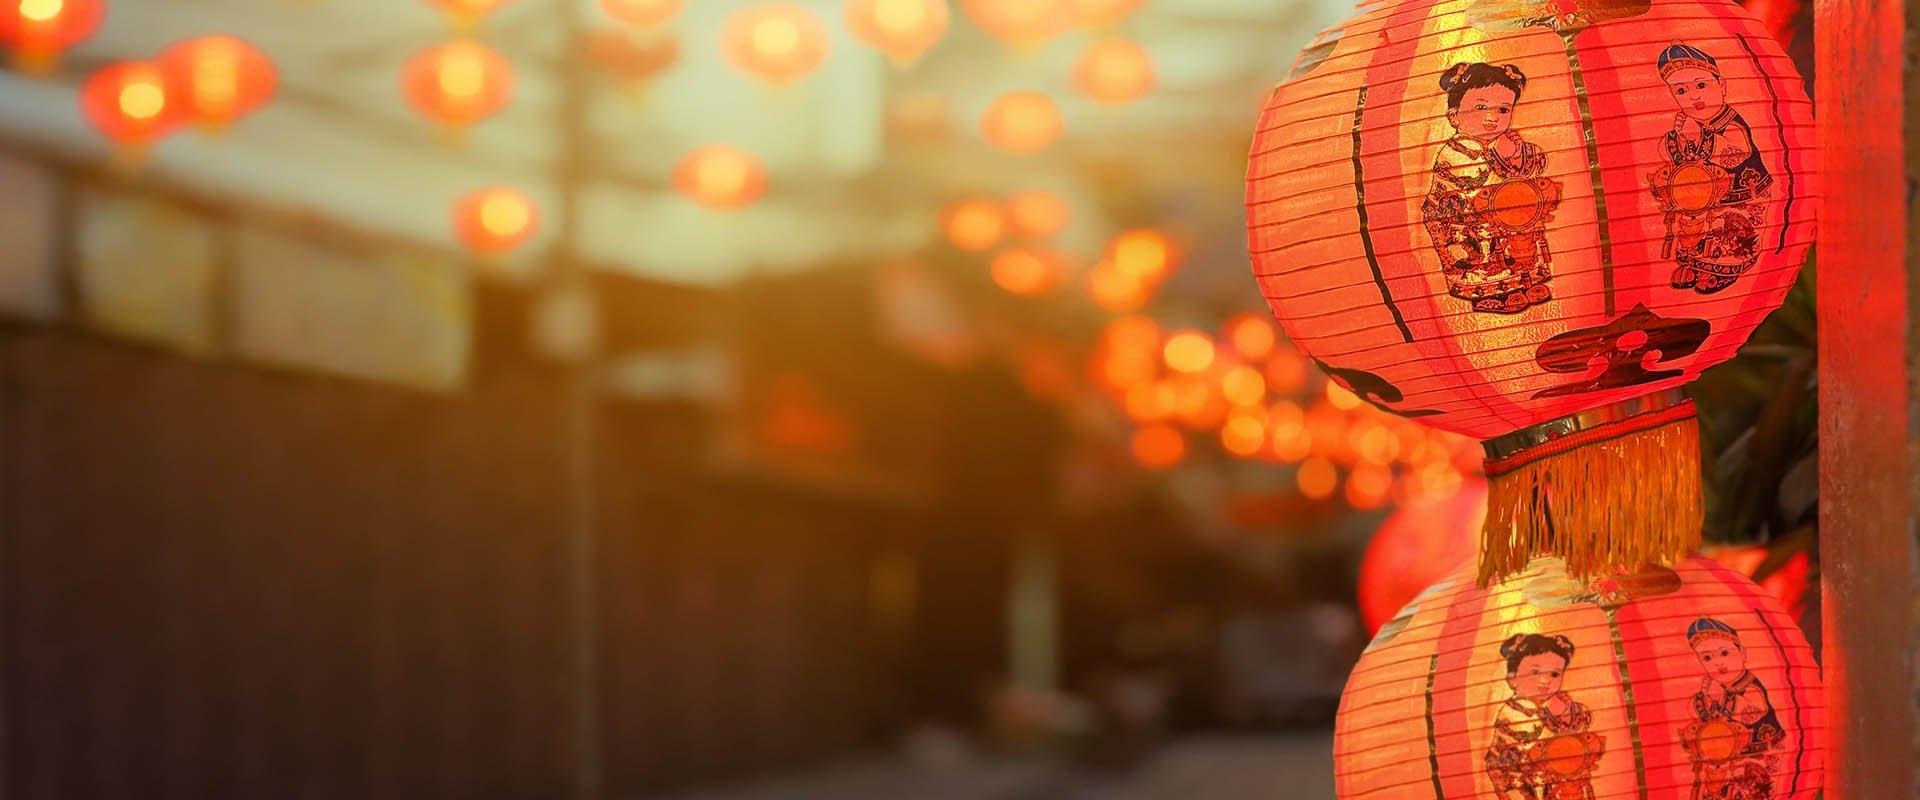 Tahun Baru Cina 2019 Dan 2020 - Publicholidays.my Calendar 2019 Raya Cina